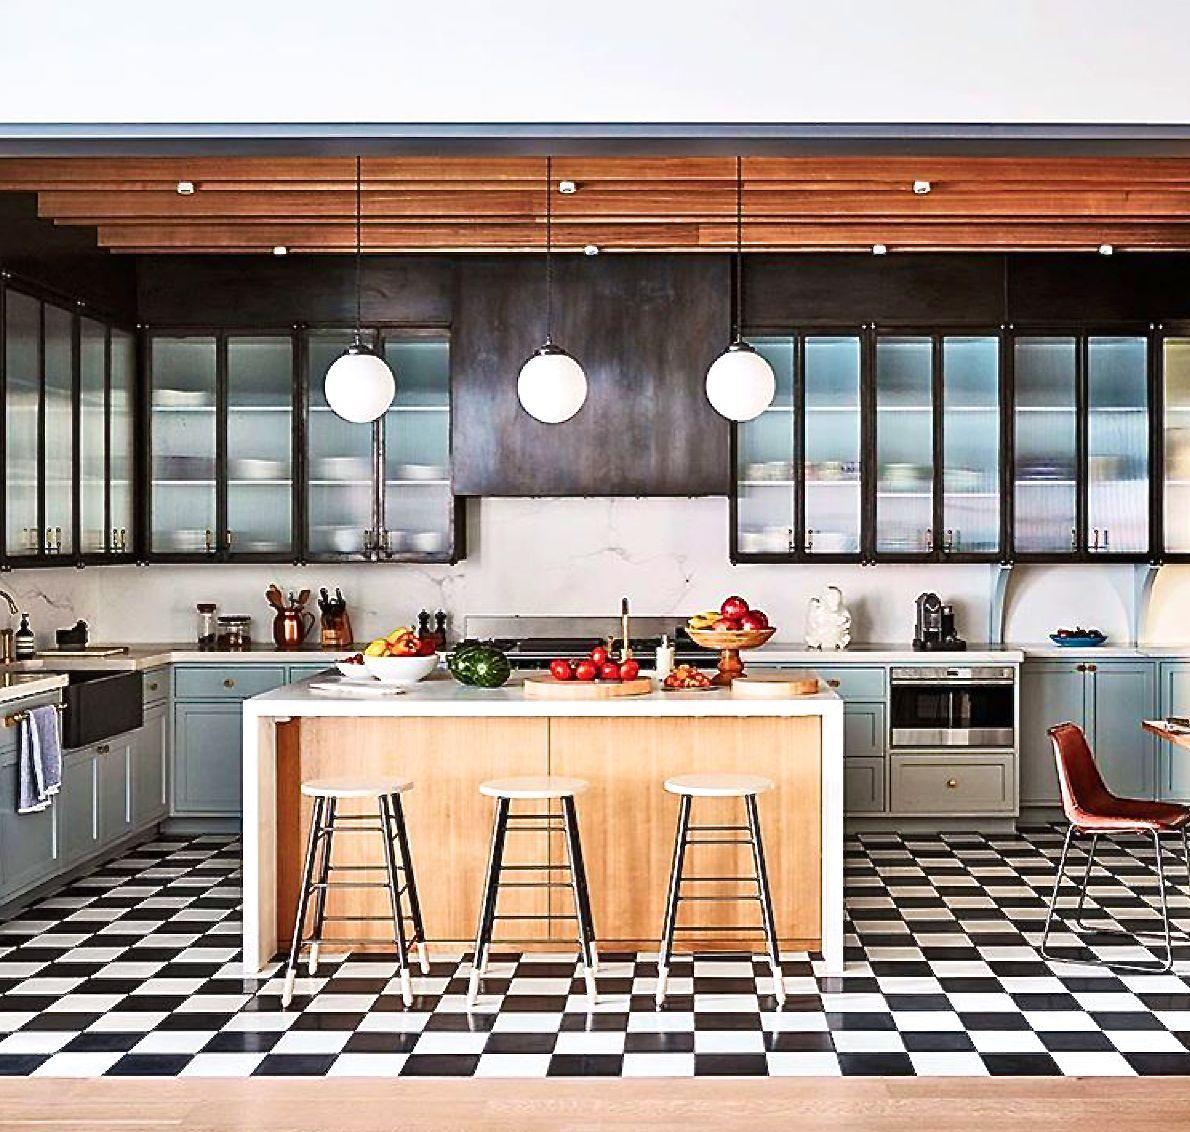 Naomi Watts and Liev Schreiber New York City Apartment   Naomi Watts ...